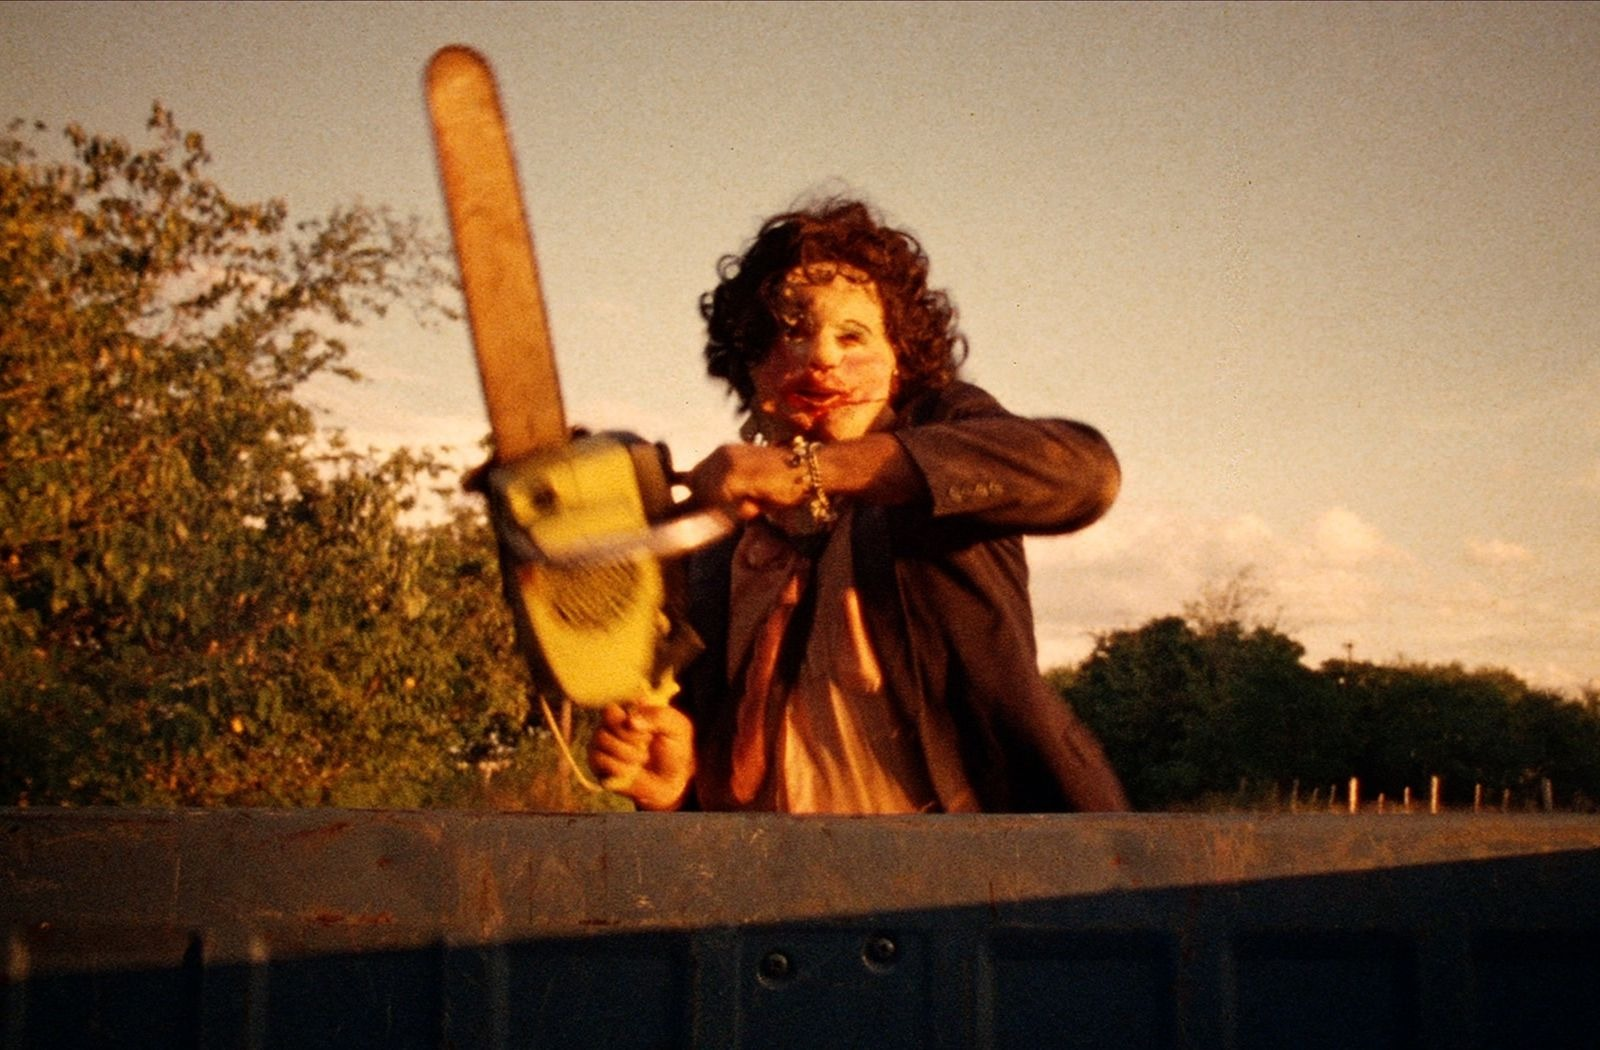 El reboot de Texas Chainsaw Massacre de Fede Álvarez ficha a su guionista